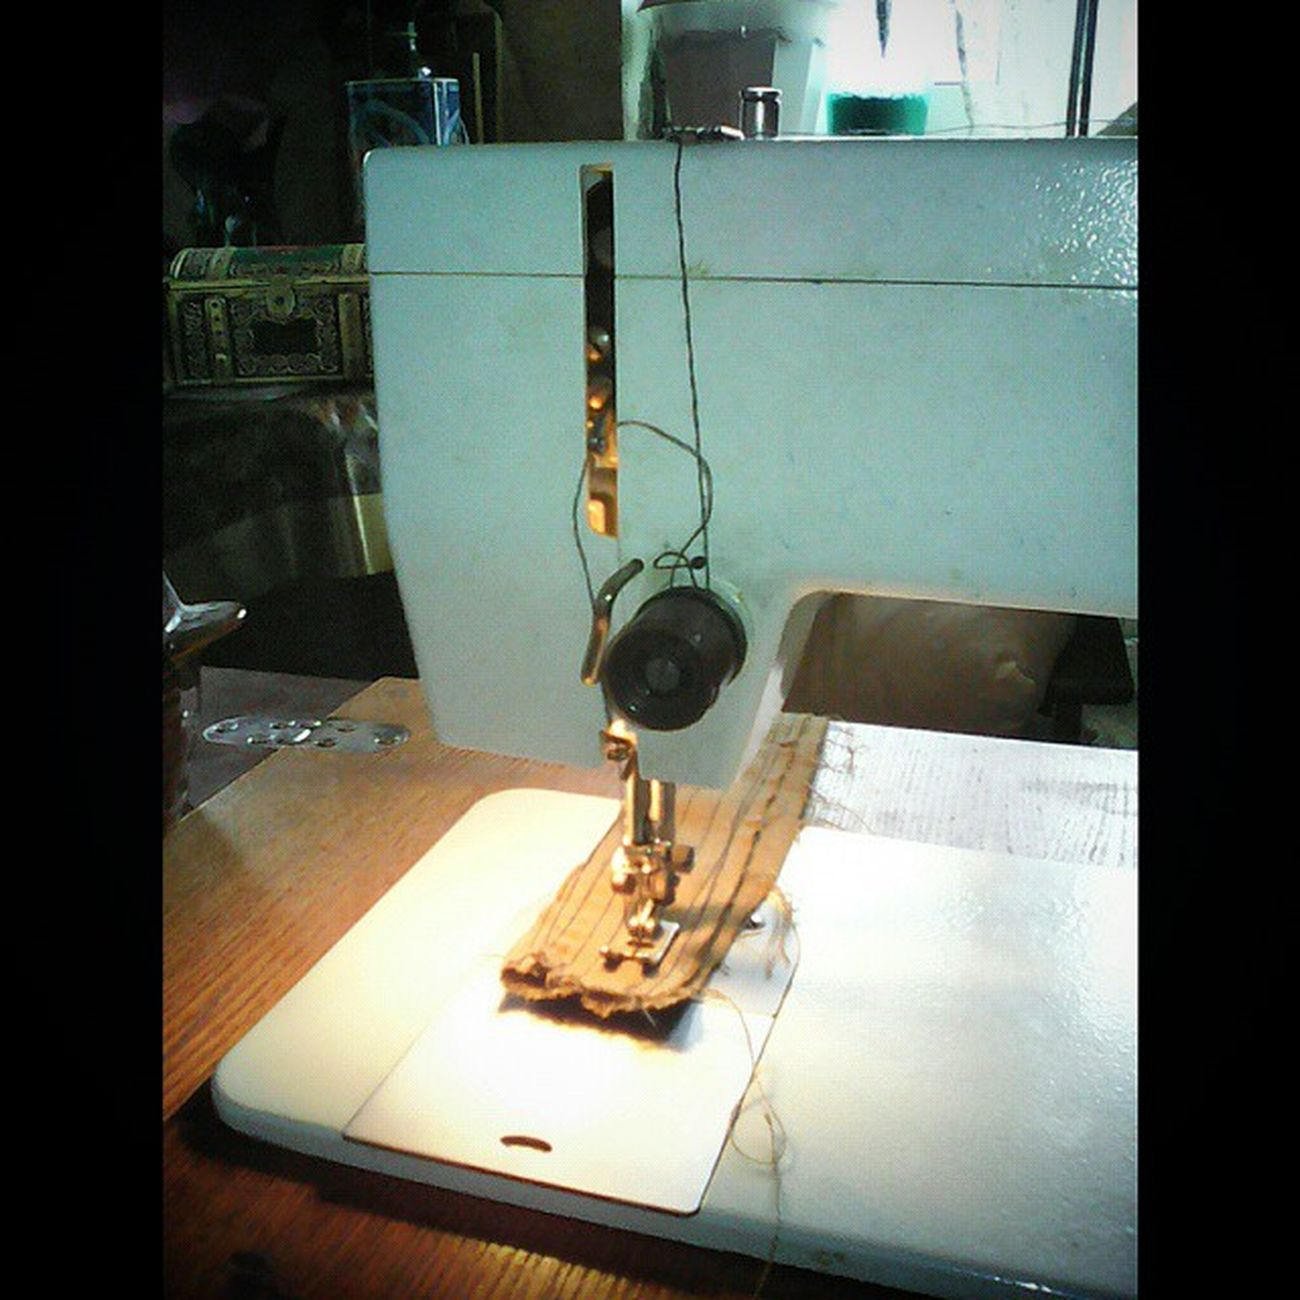 Chaika143A Sewingmachine Sew Чайка143А ЯшьюСама ШвейнаяМашина ШвейнаяМашинка magn_ser SquareInstaPic